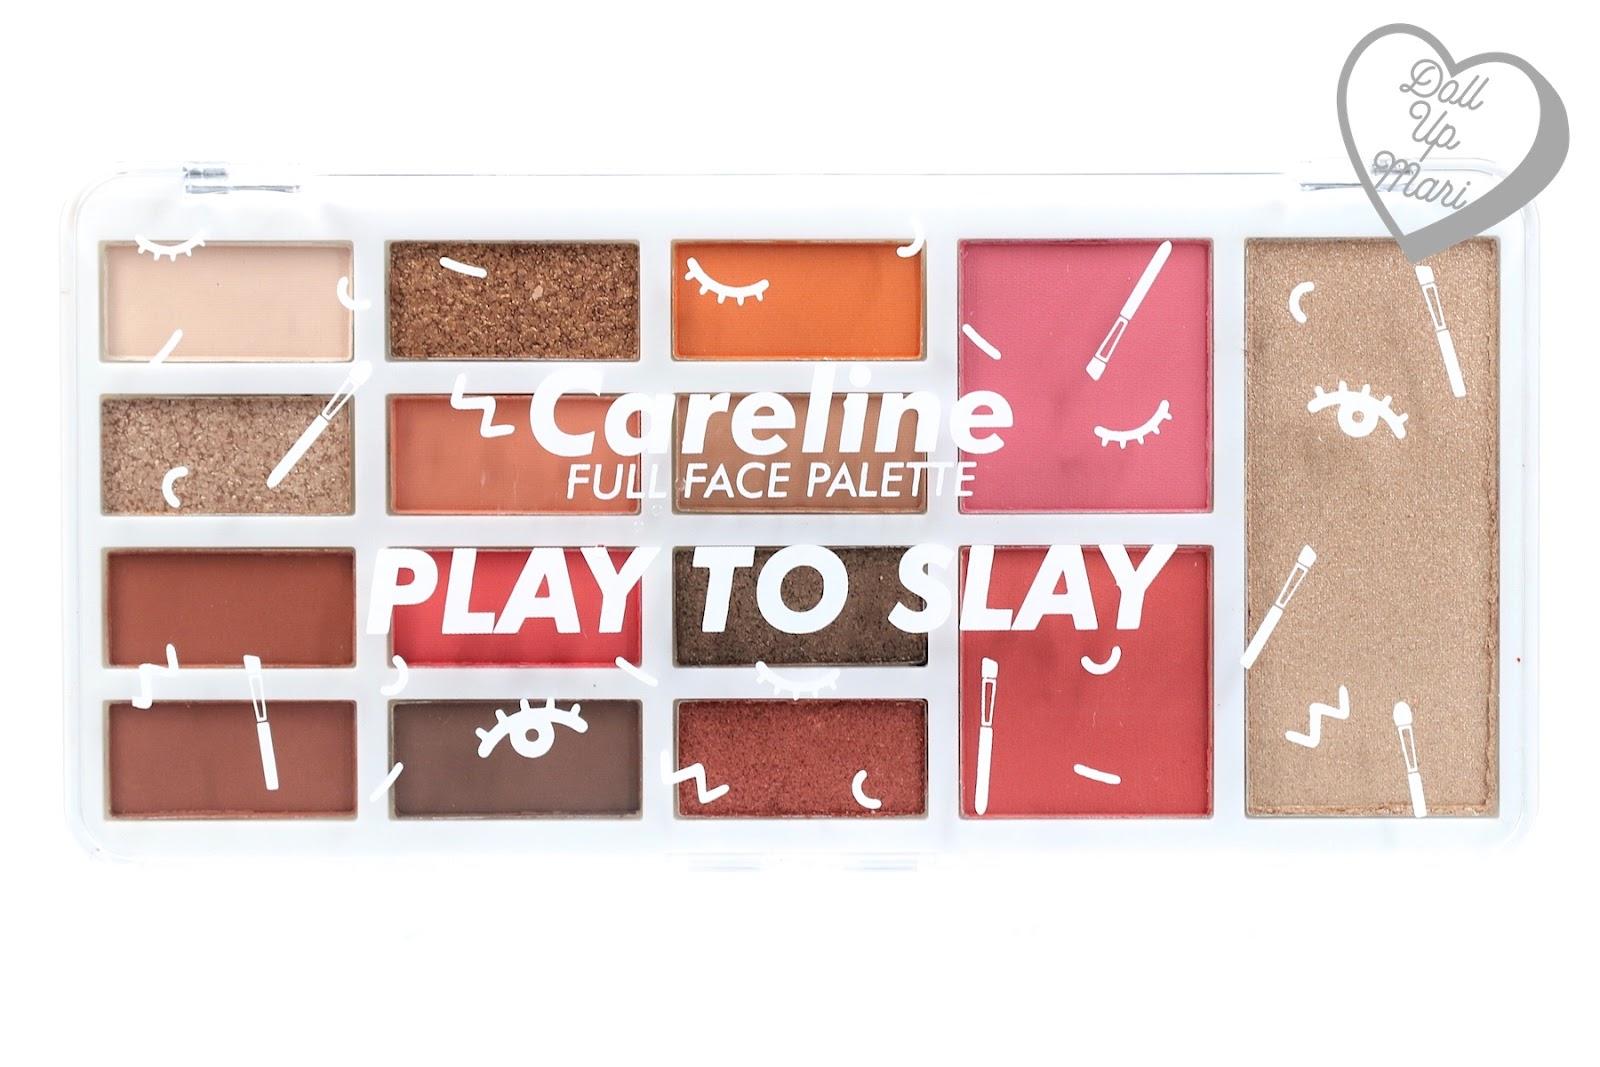 Careline Play To Slay Palette